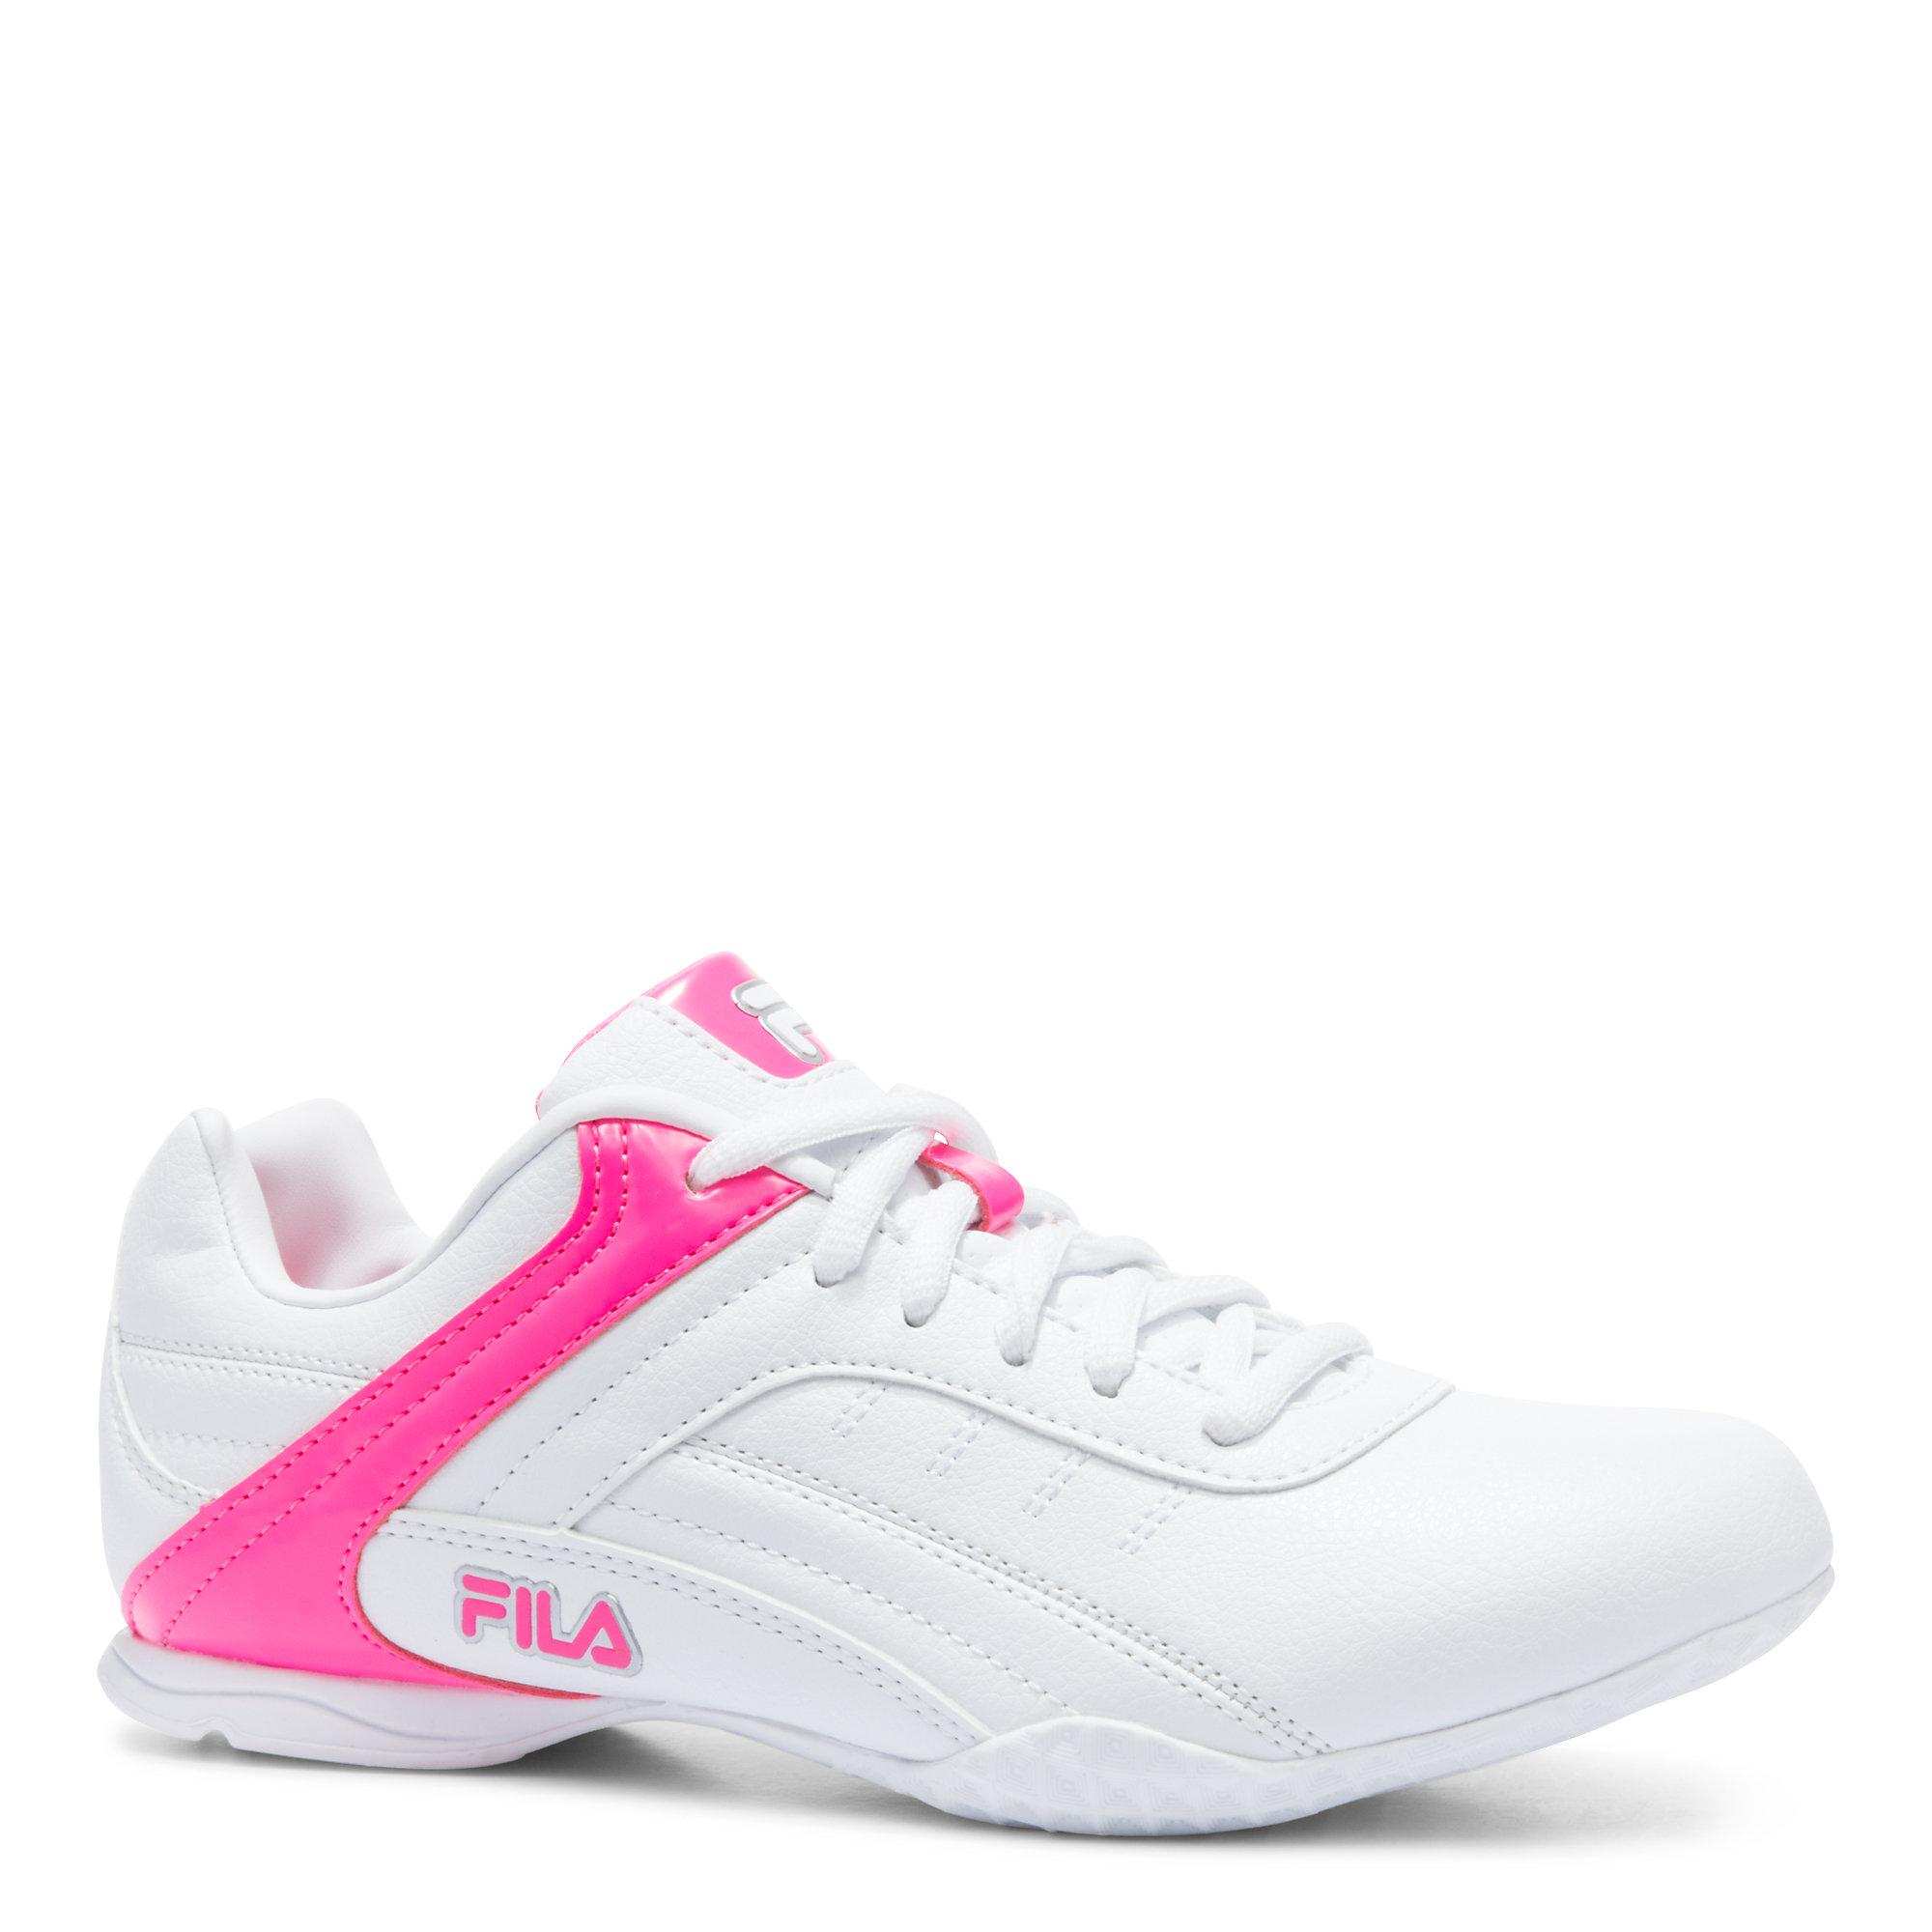 fila womens elleray 5 casual shoes ebay